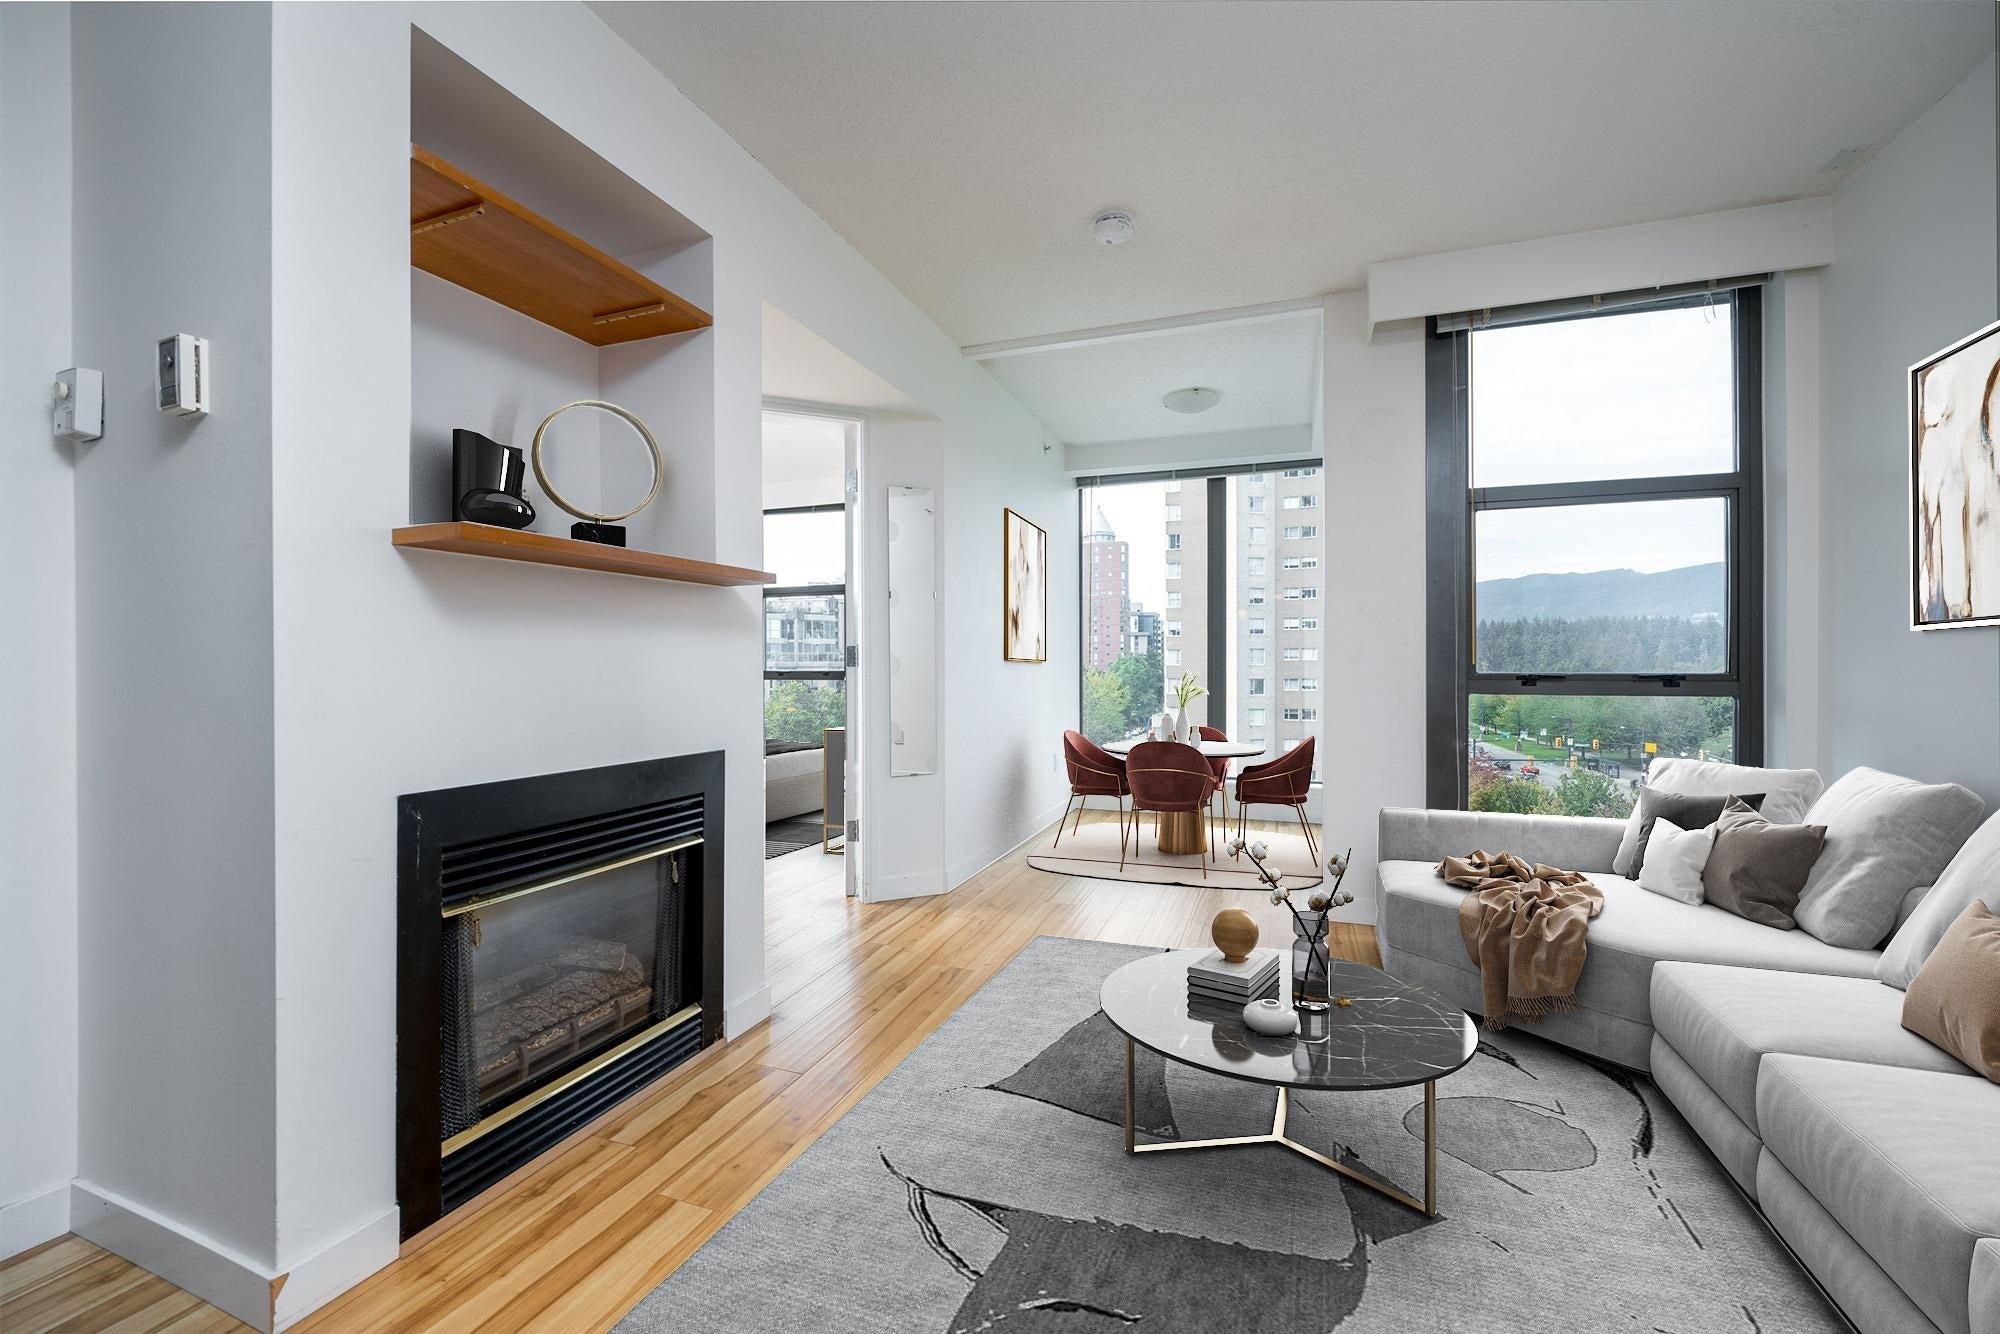 705 1723 ALBERNI STREET - West End VW Apartment/Condo for sale, 1 Bedroom (R2622898) - #1